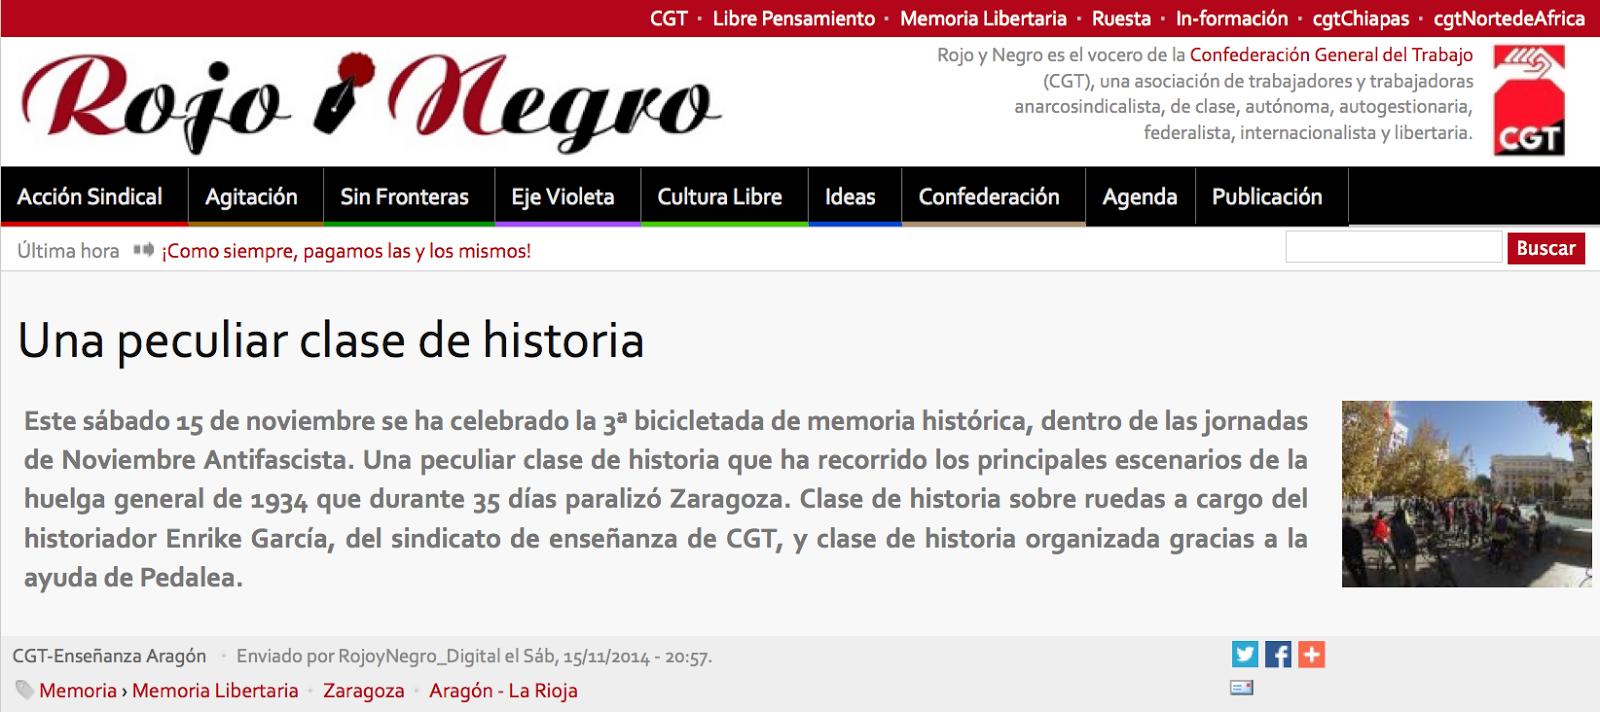 http://www.rojoynegro.info/articulo/memoria/una-peculiar-clase-historia